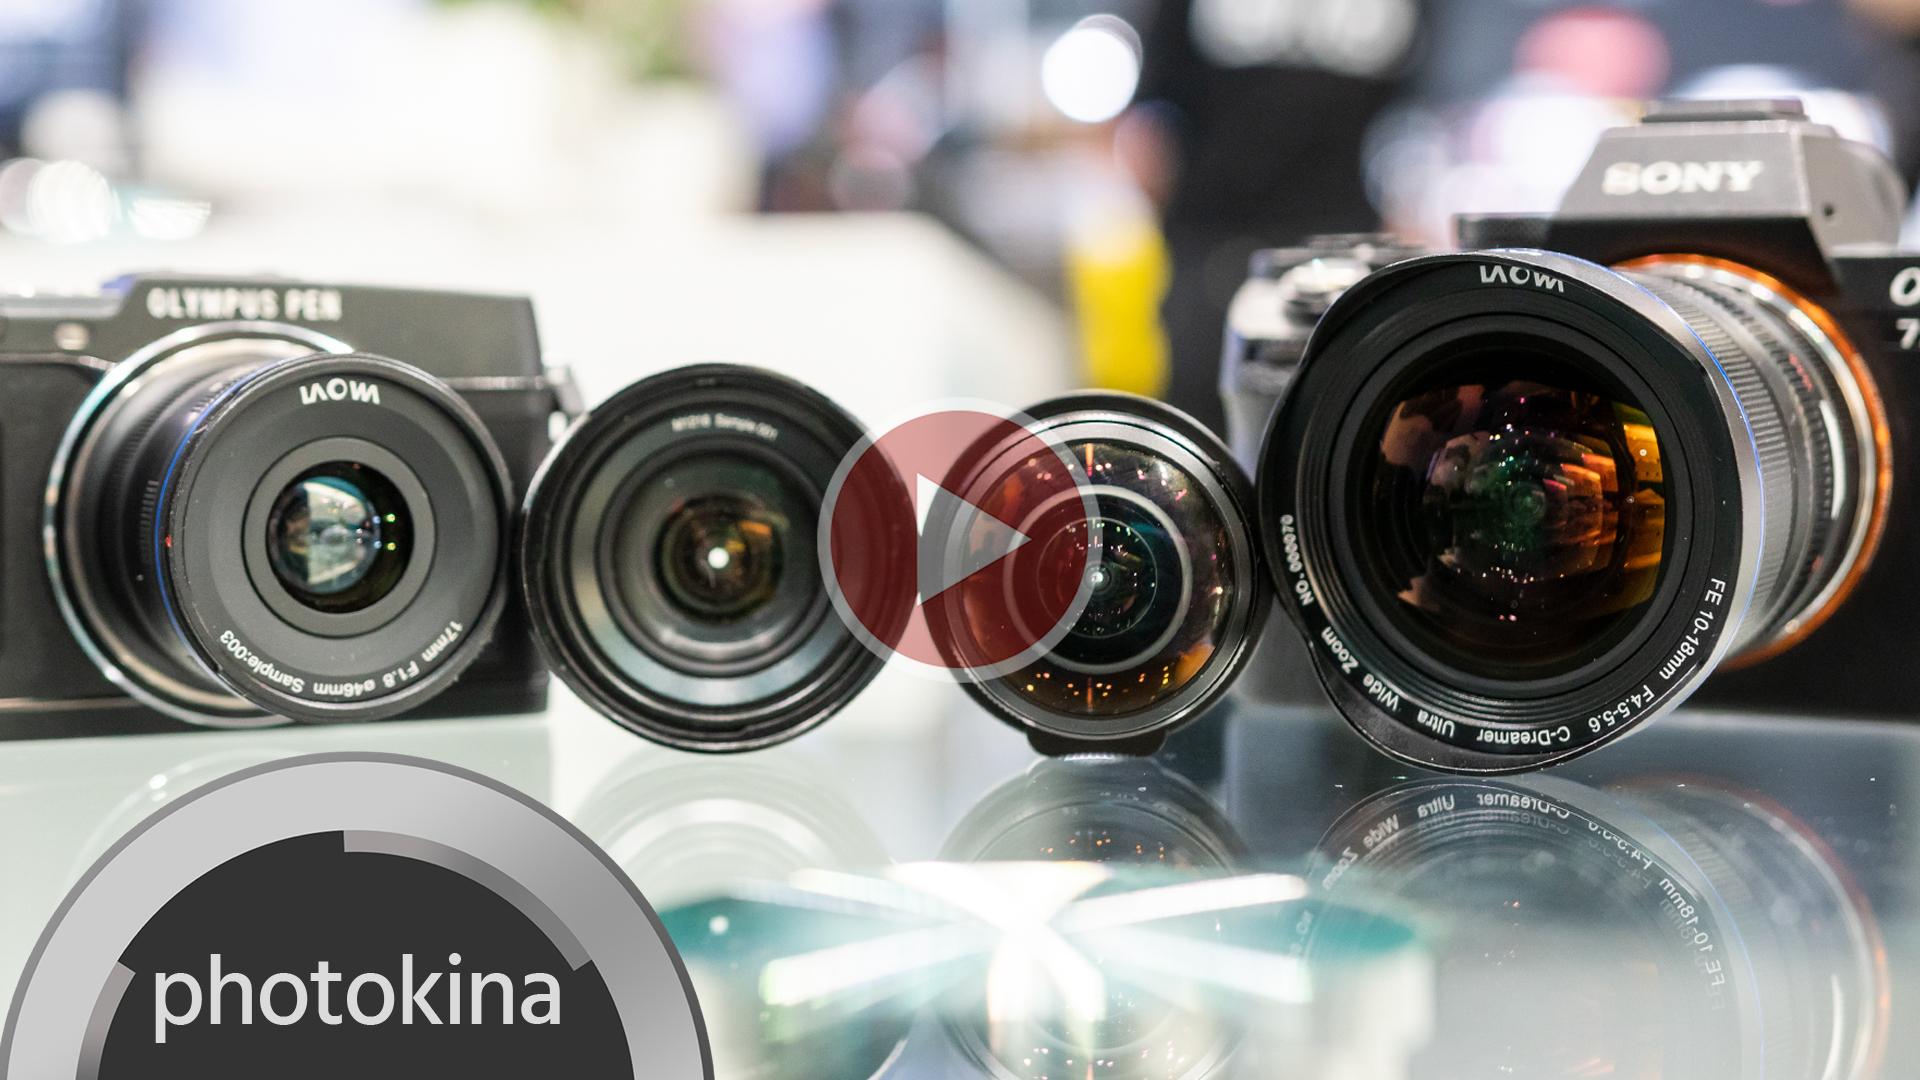 Laowa presenta 4 nuevos lentes de gran angular para Montura E y Micro 4/3